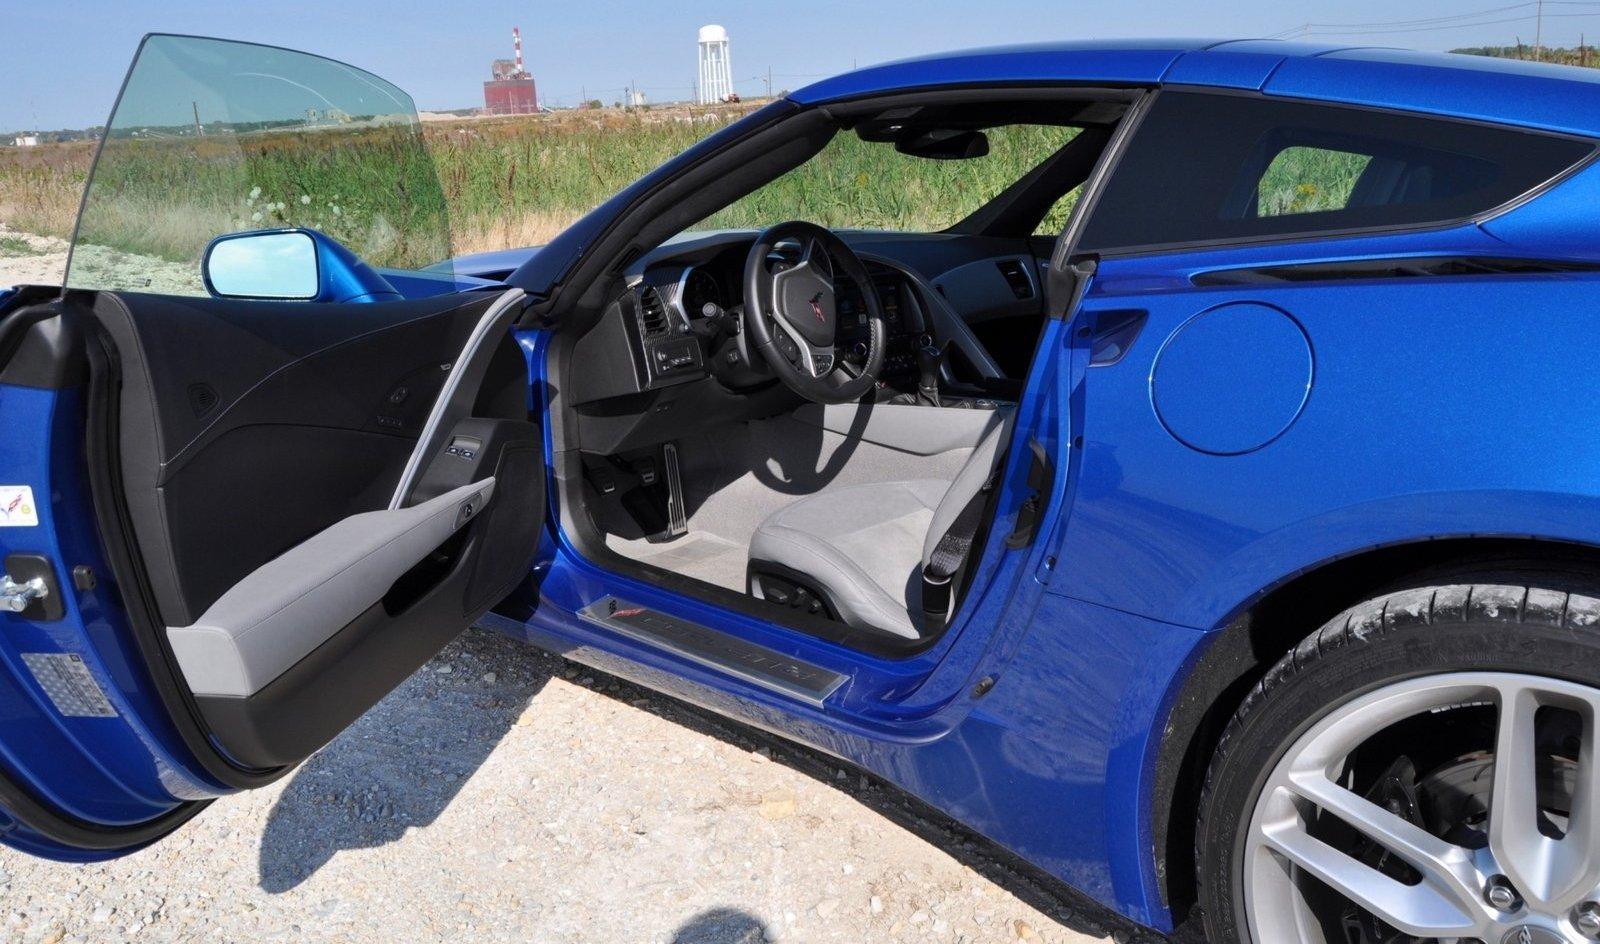 corvette 1lt vs 2lt vs 3lt autos post. Black Bedroom Furniture Sets. Home Design Ideas